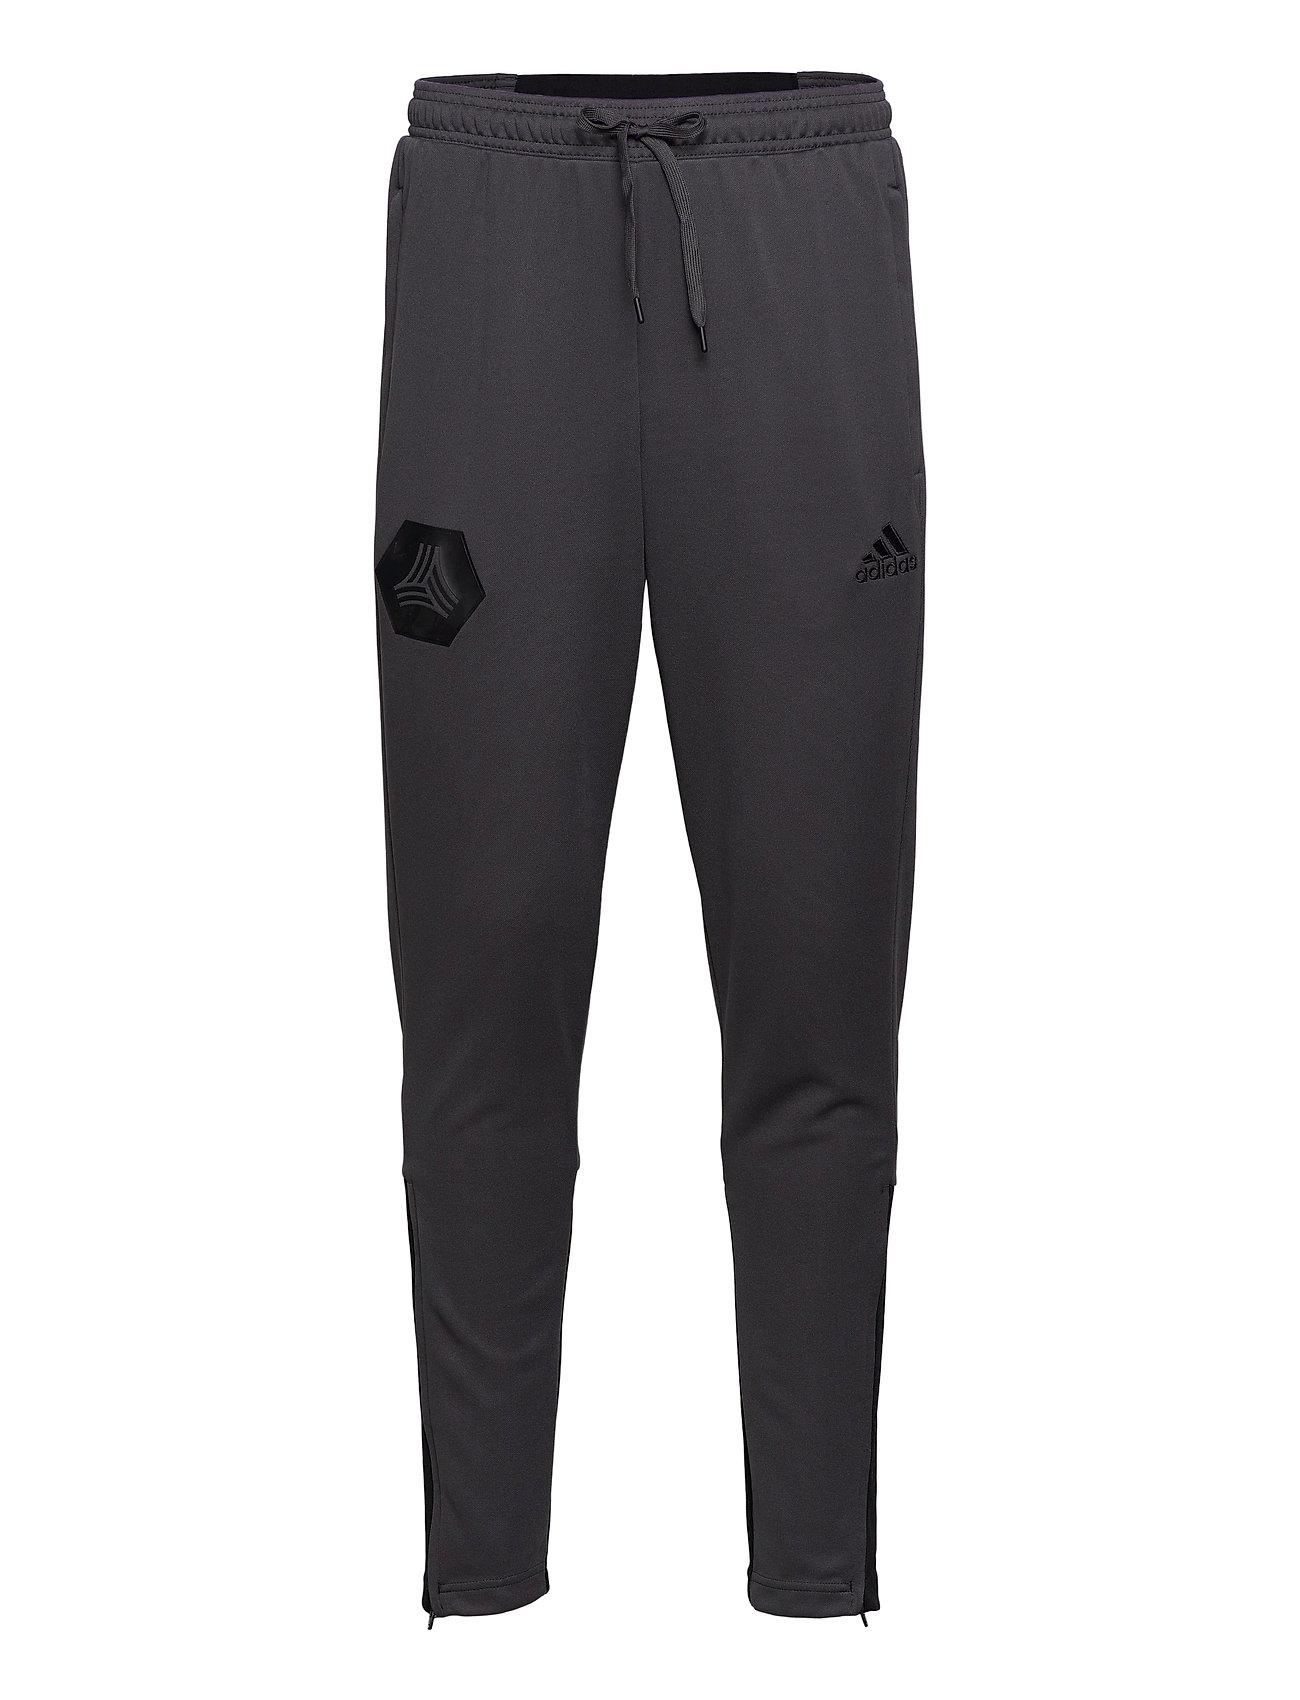 Image of Tan Tr Pant Sport Pants Grå Adidas Performance (3431377091)